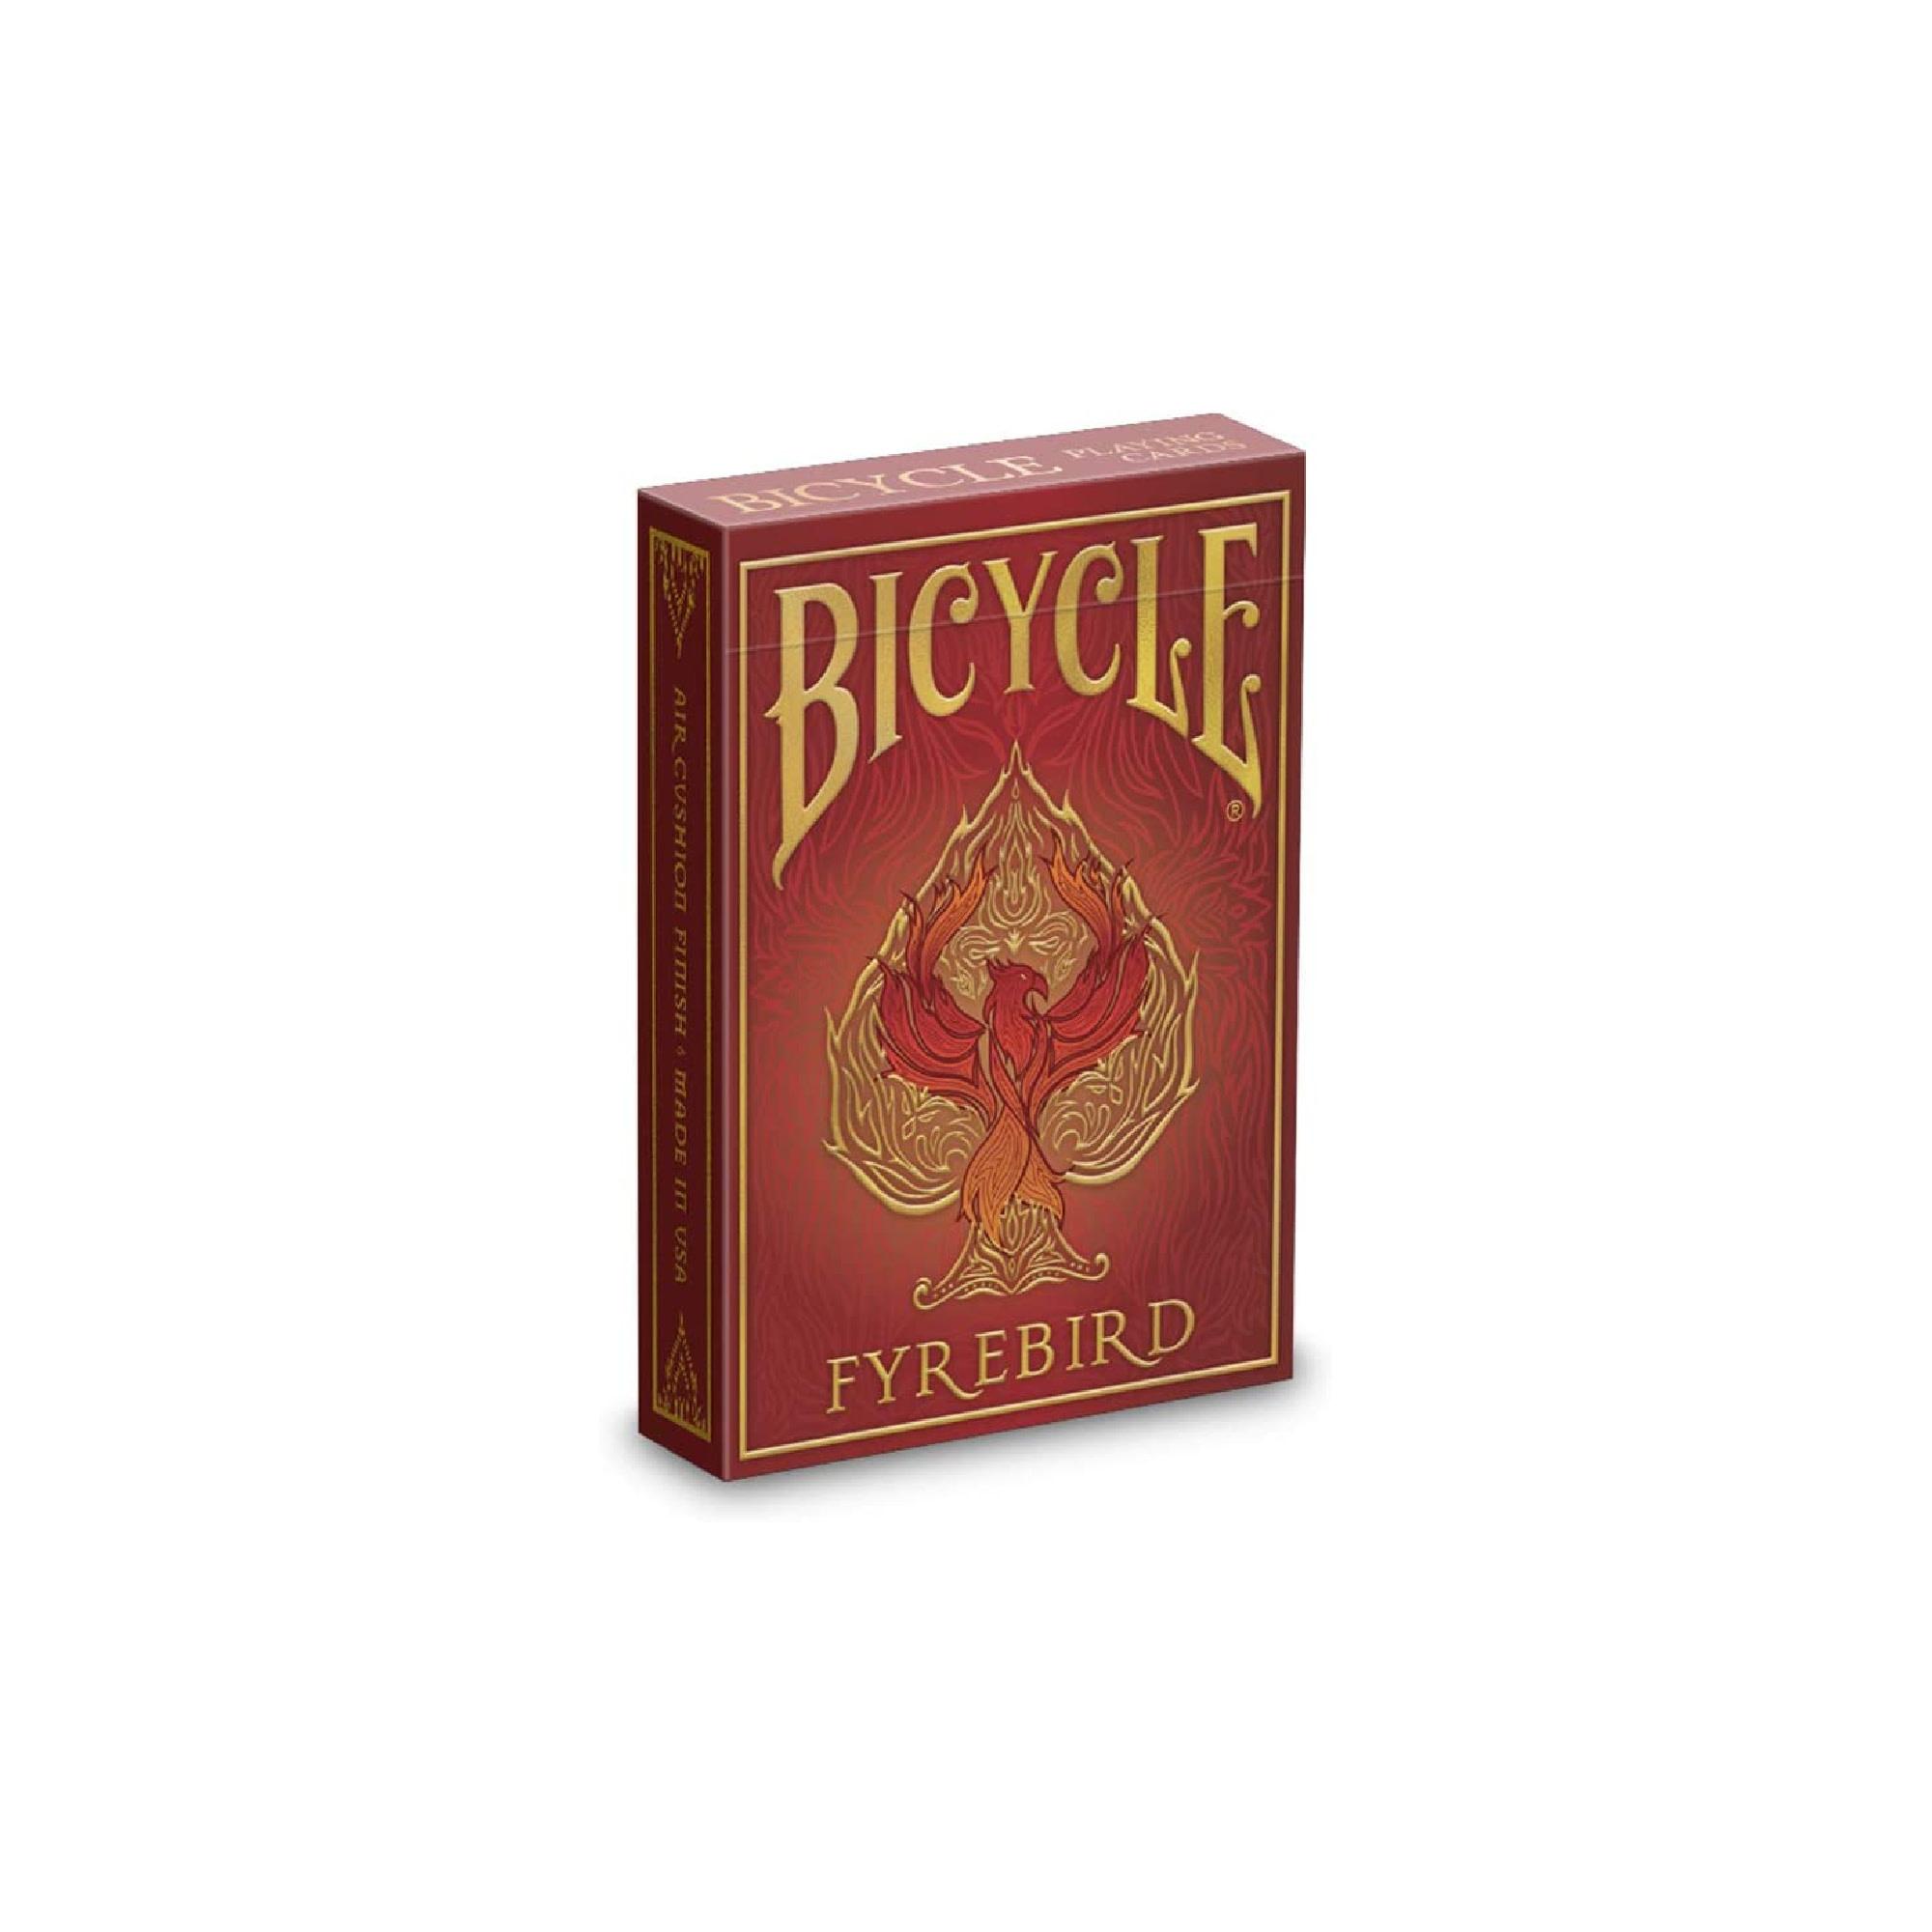 Bicycle Cartes à jouer Bicycle - Fyrebird